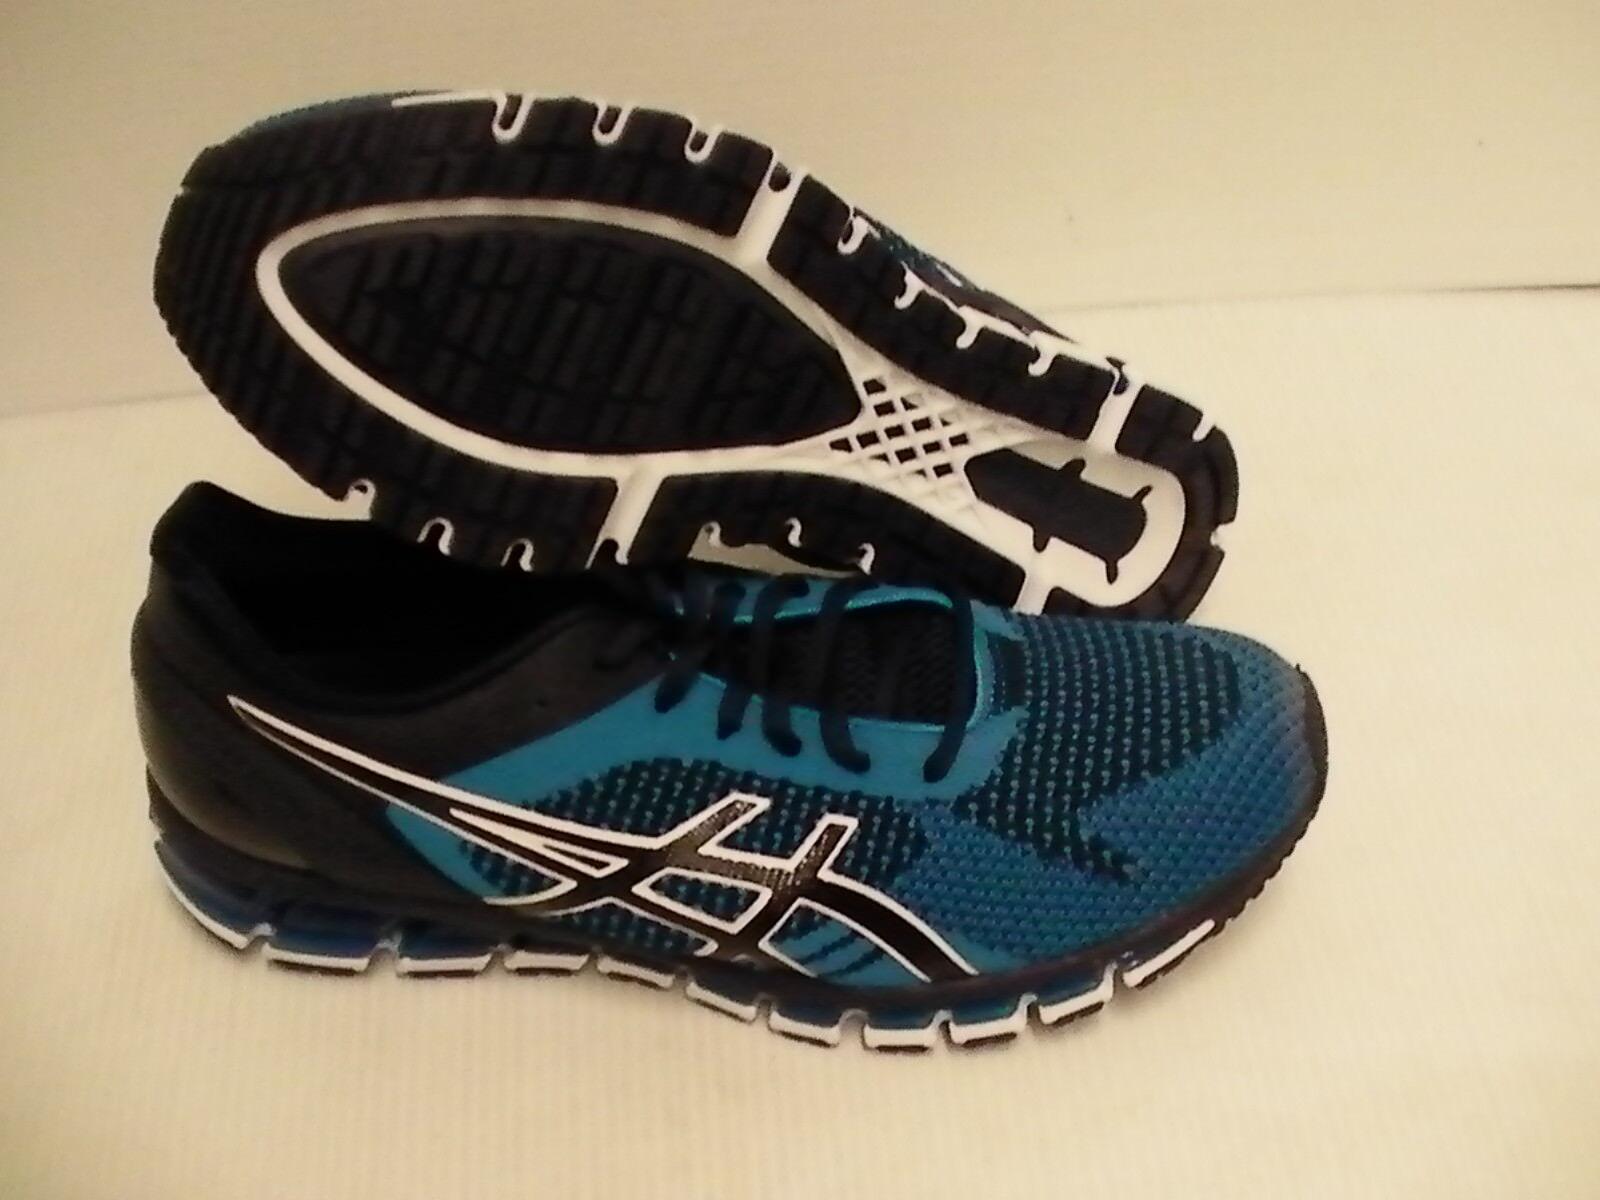 Asics men's gel quantum 360 knit running shoes peacoat directoire bluee size 13